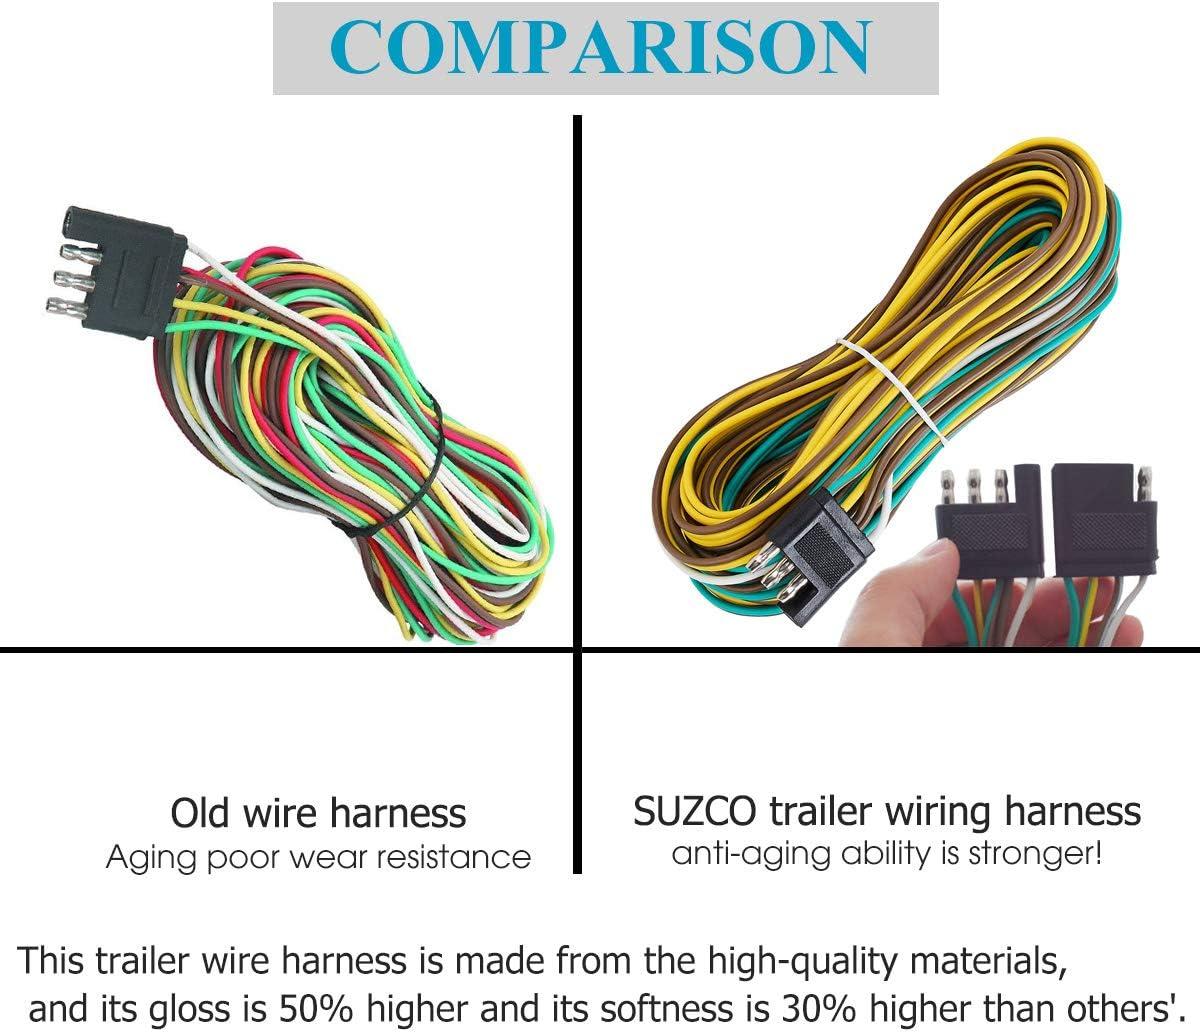 quality trailer wiring diagram amazon com suzco 25 foot 4 wire 4 flat trailer light wiring  4 wire 4 flat trailer light wiring